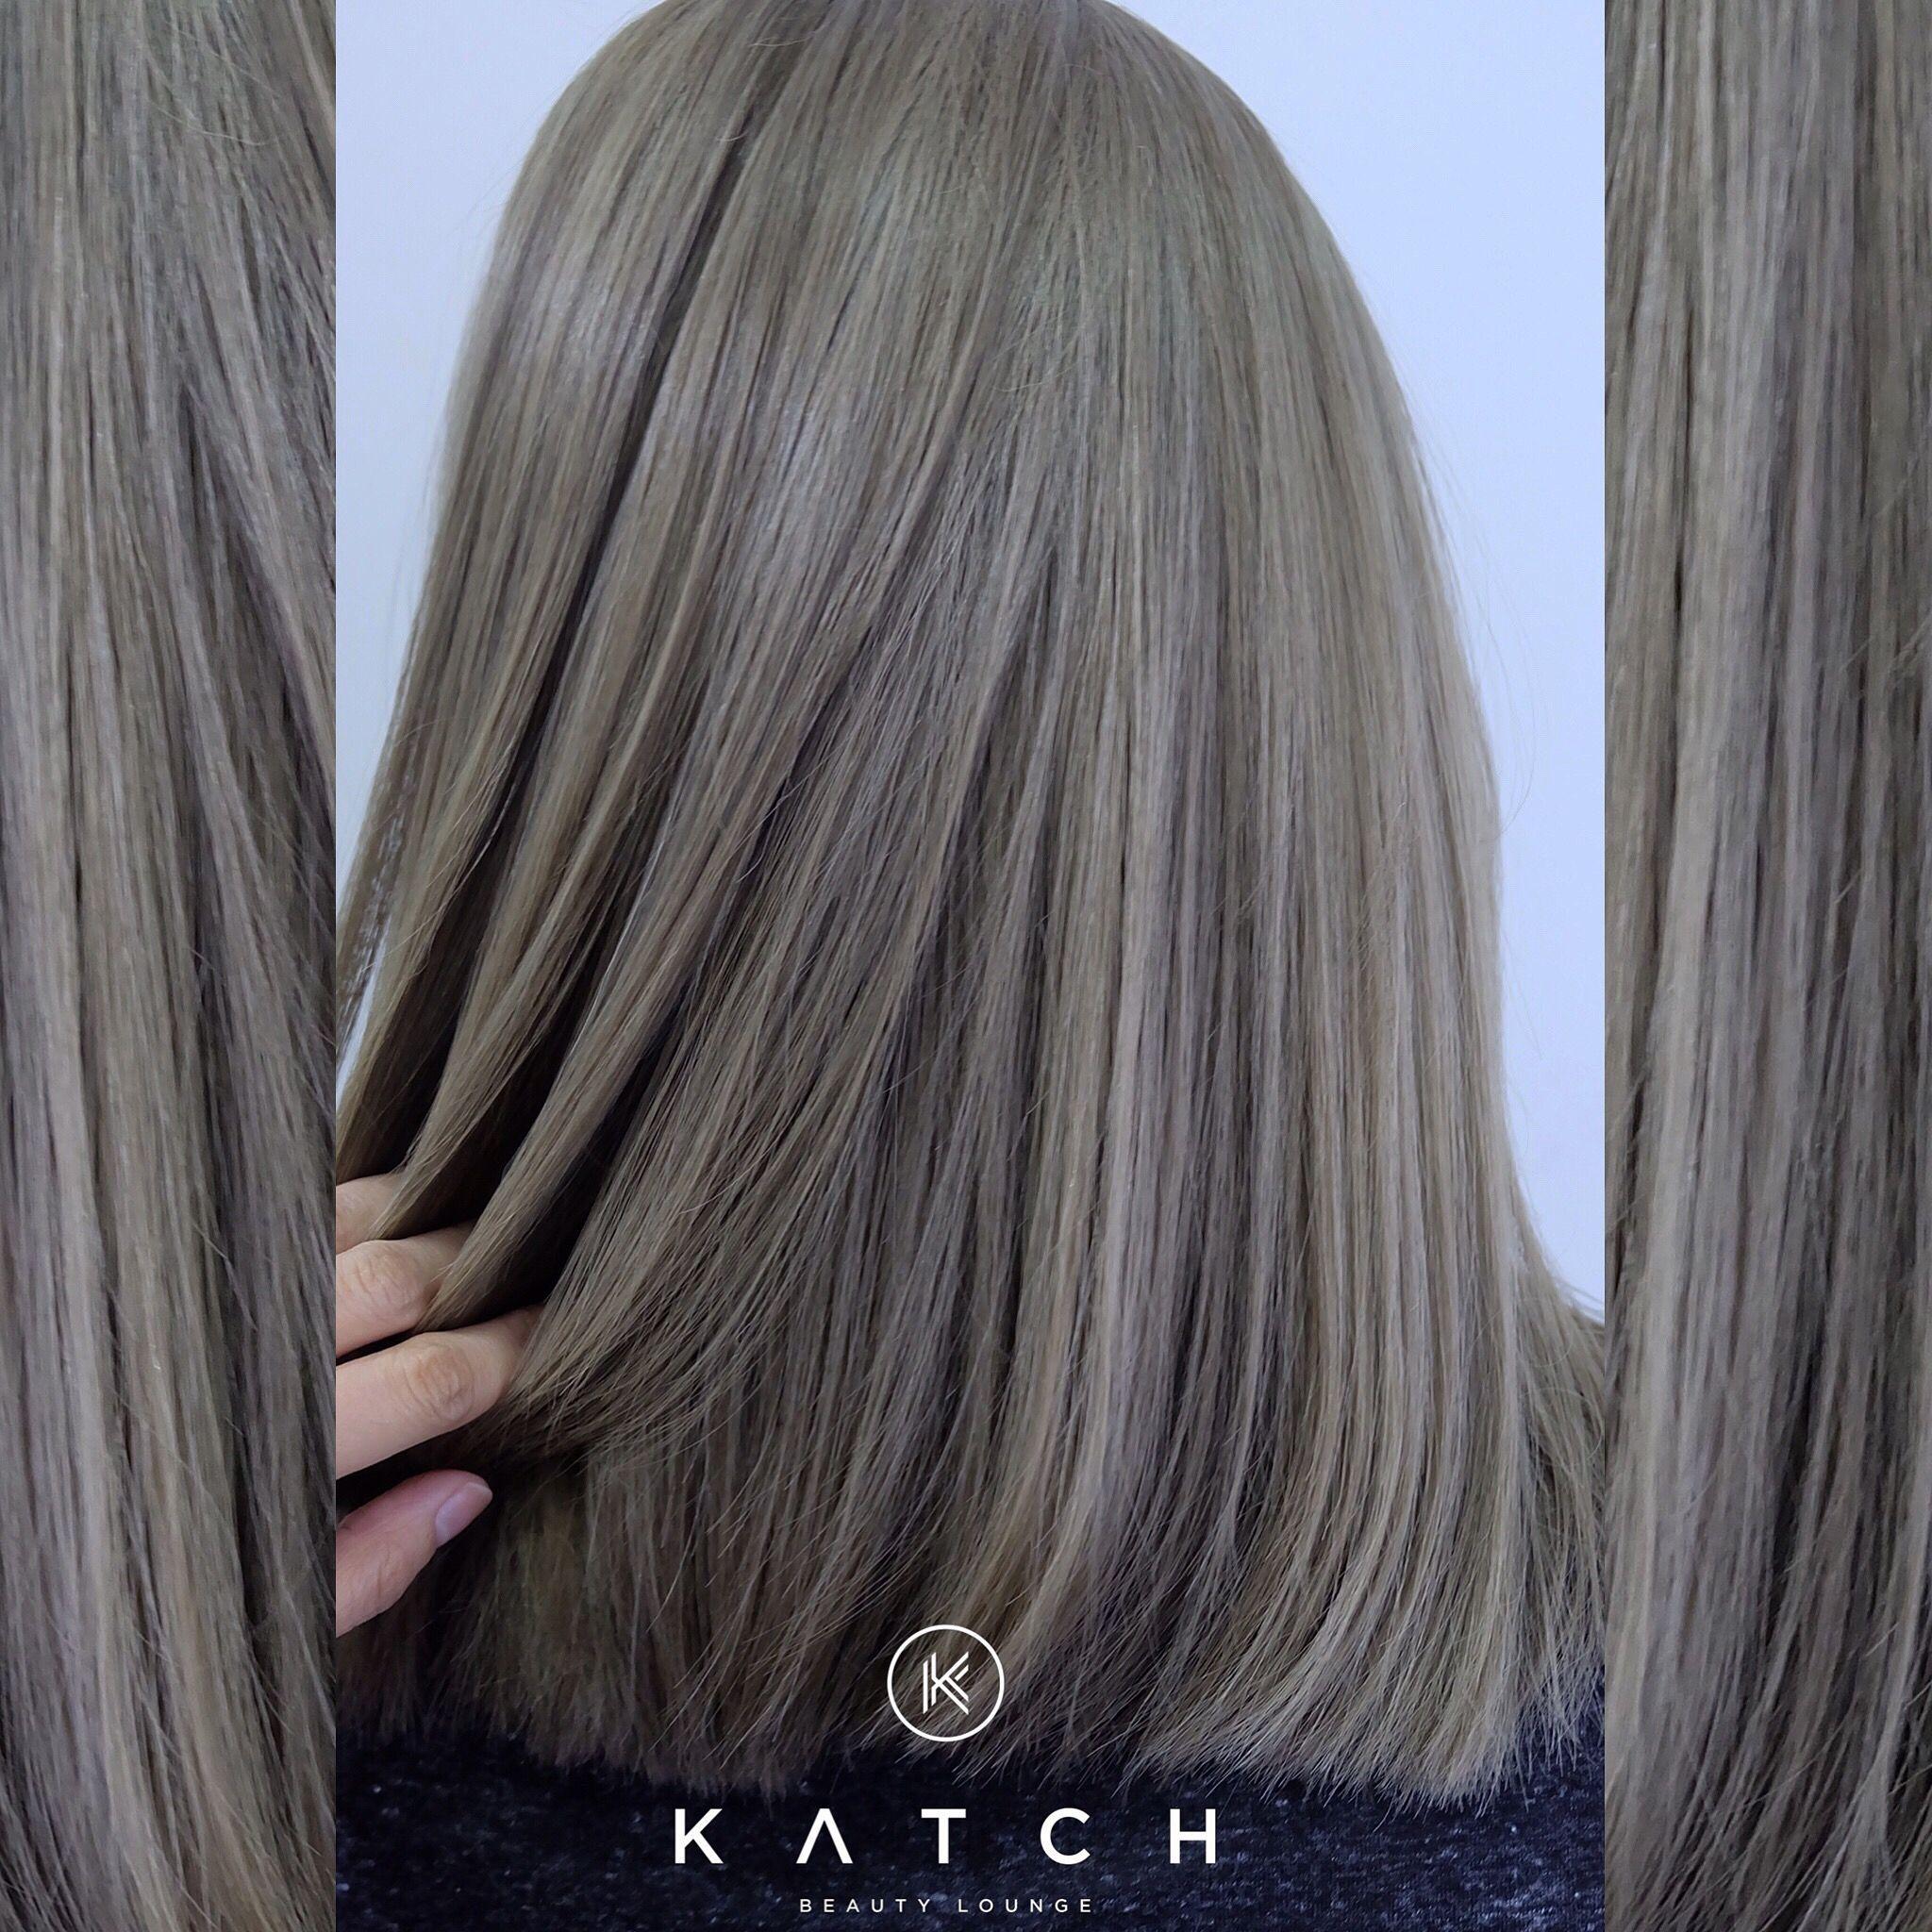 Katch Beauty Lounge 2nd Level, Northeast Square